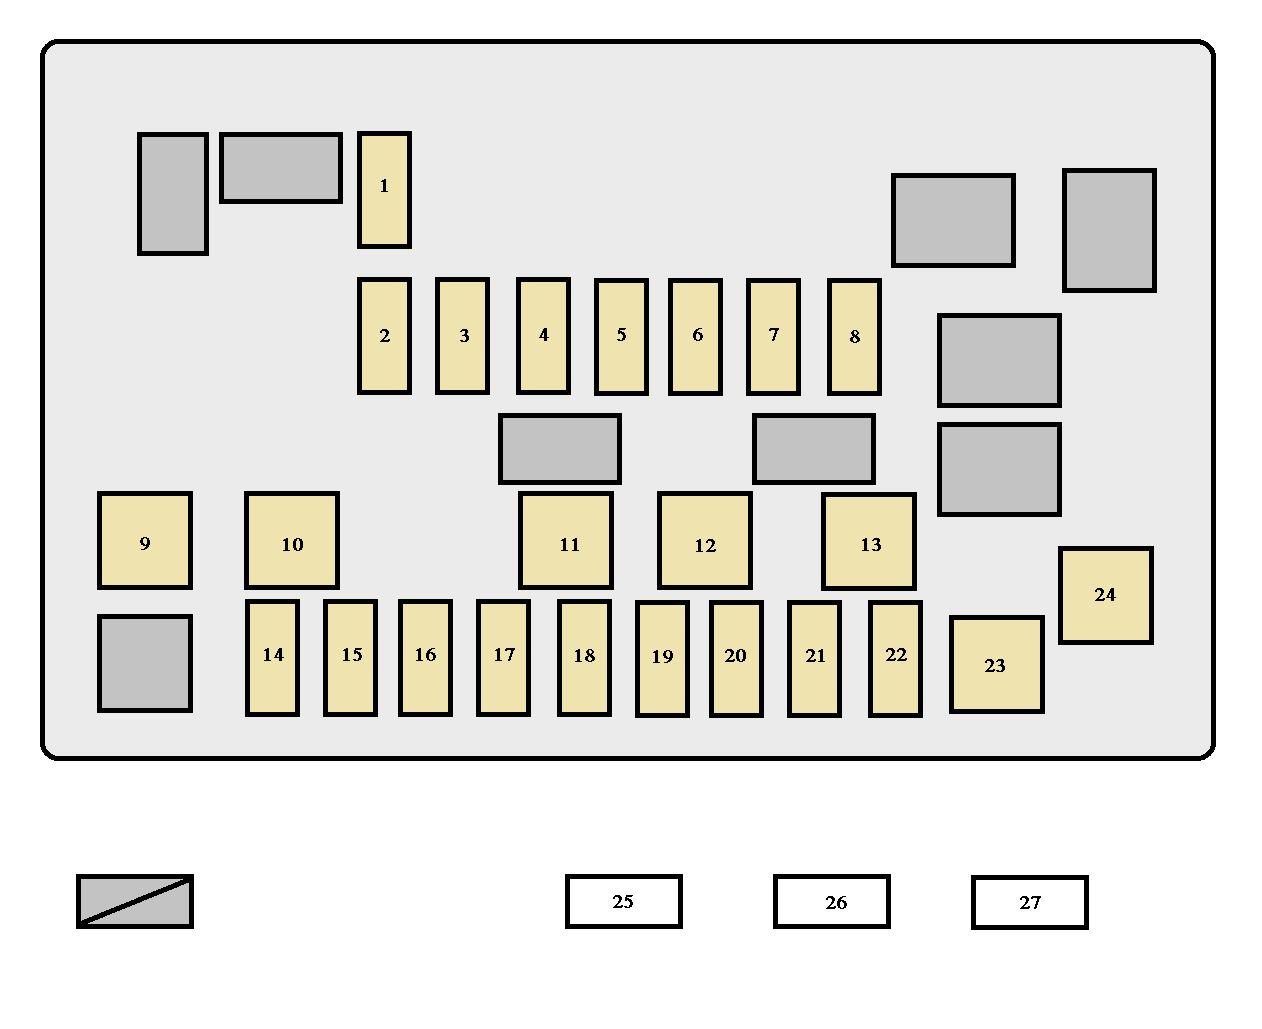 Superb 2004 Kia Sedona Fuse Box Diagram Basic Electronics Wiring Diagram Wiring Cloud Monangrecoveryedborg